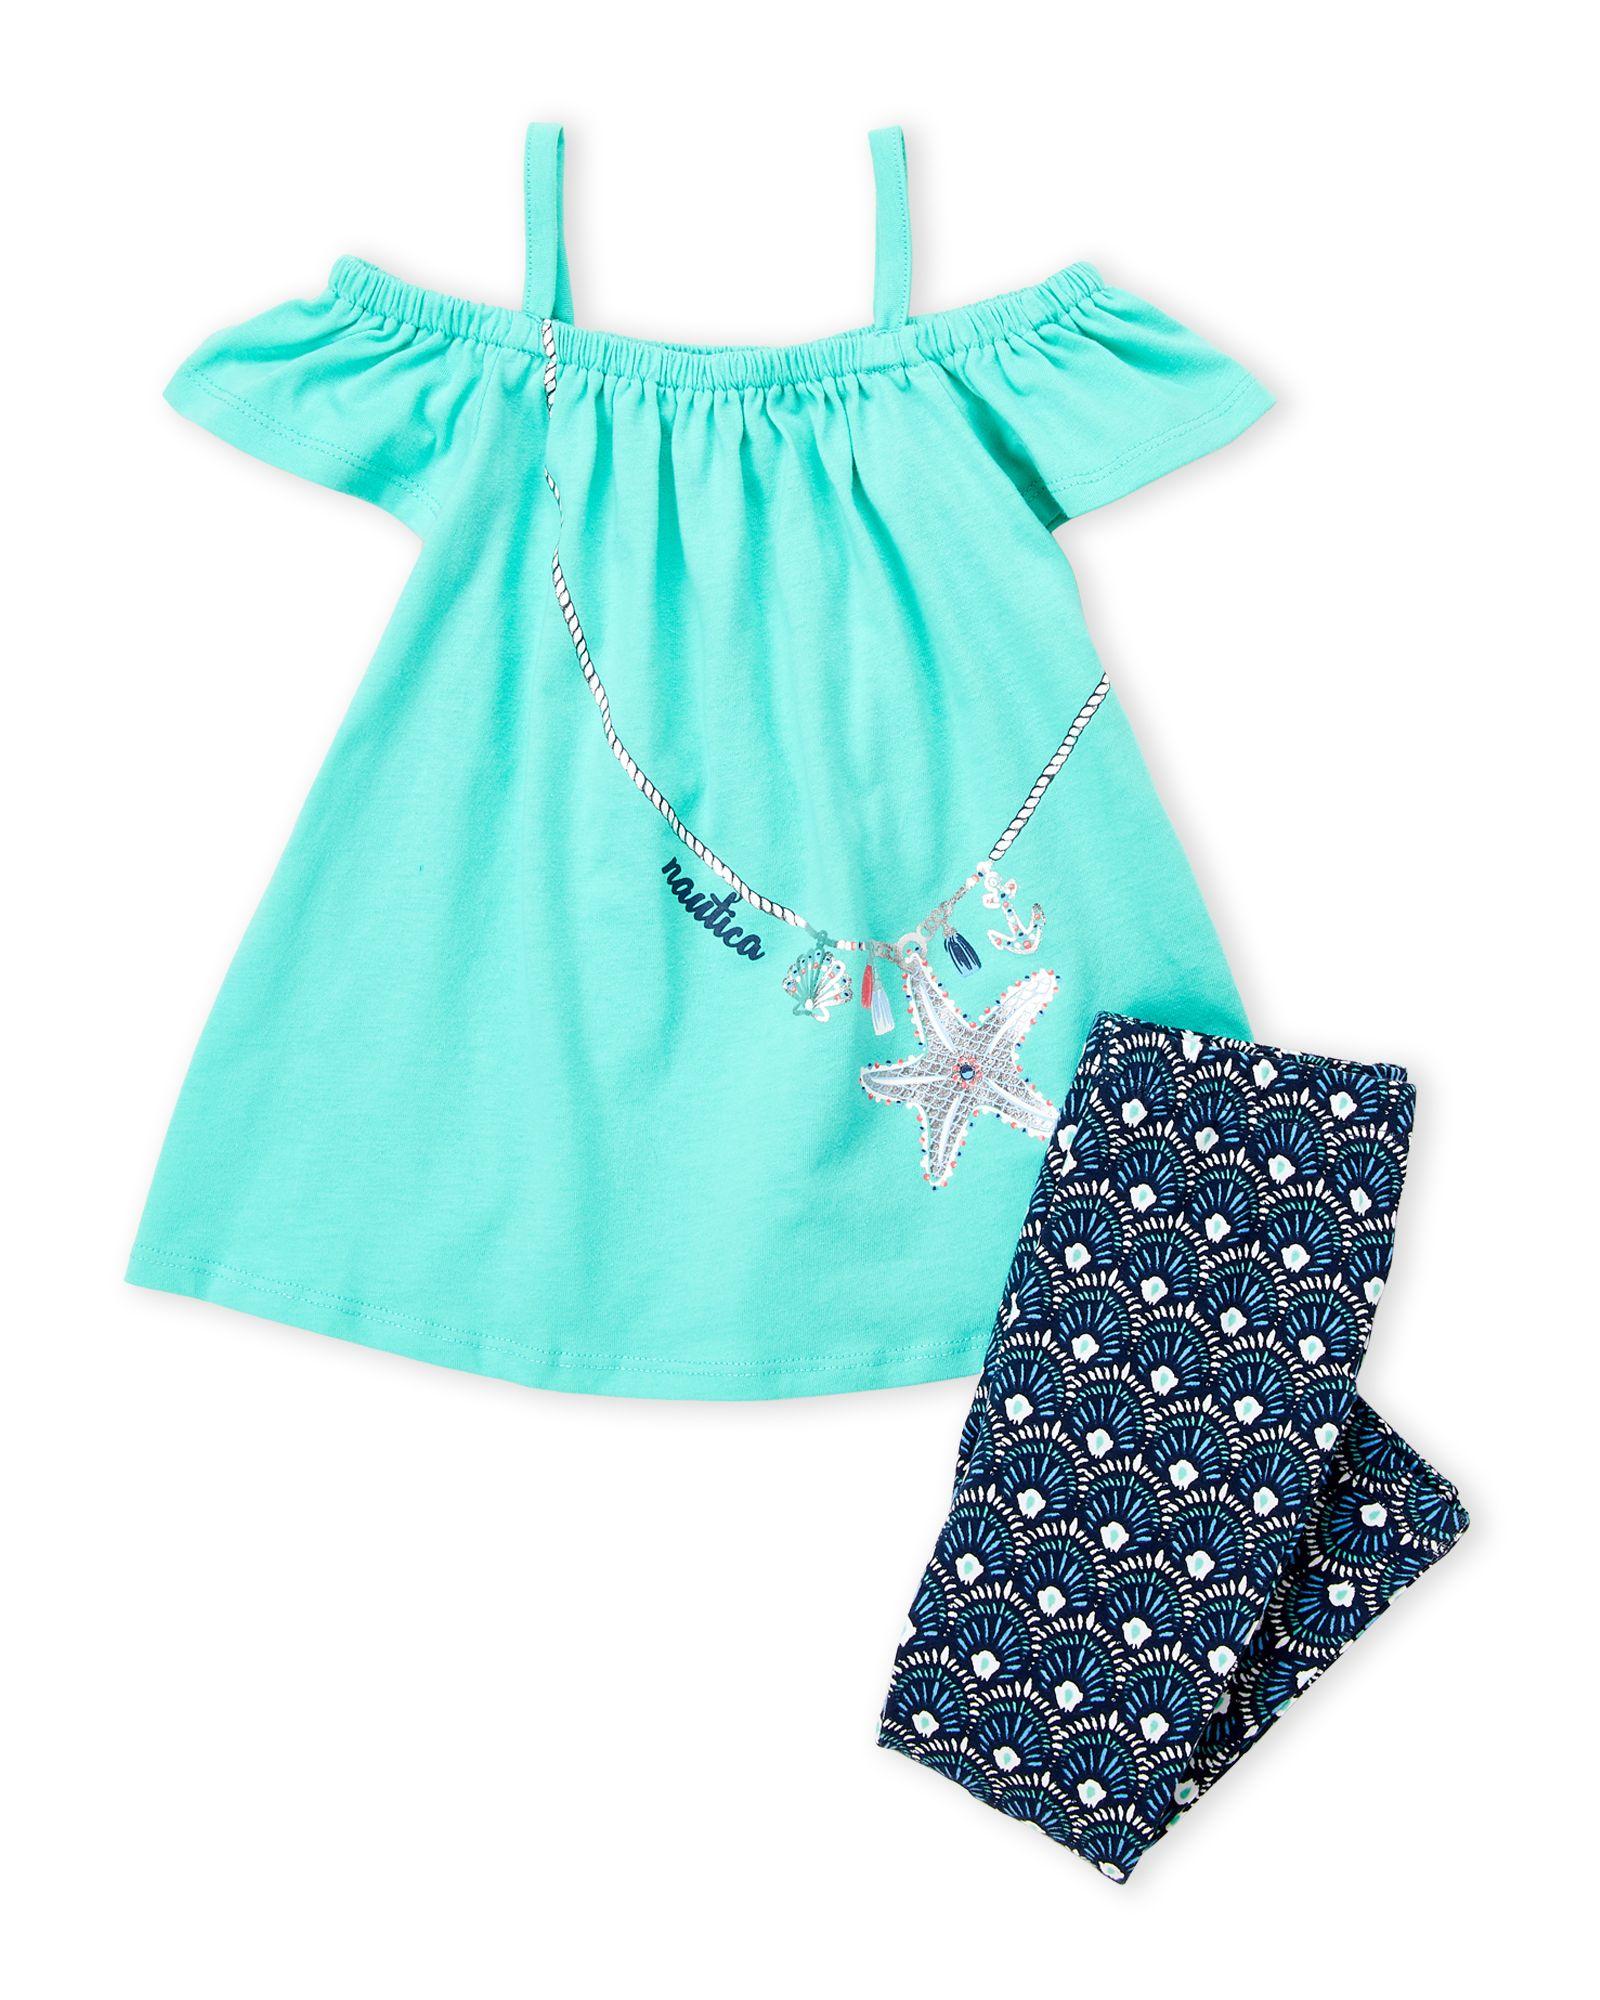 0342bcca2ed13 Nautica (Toddler Girls) Two-Piece Cold Shoulder Top & Printed Leggings Set